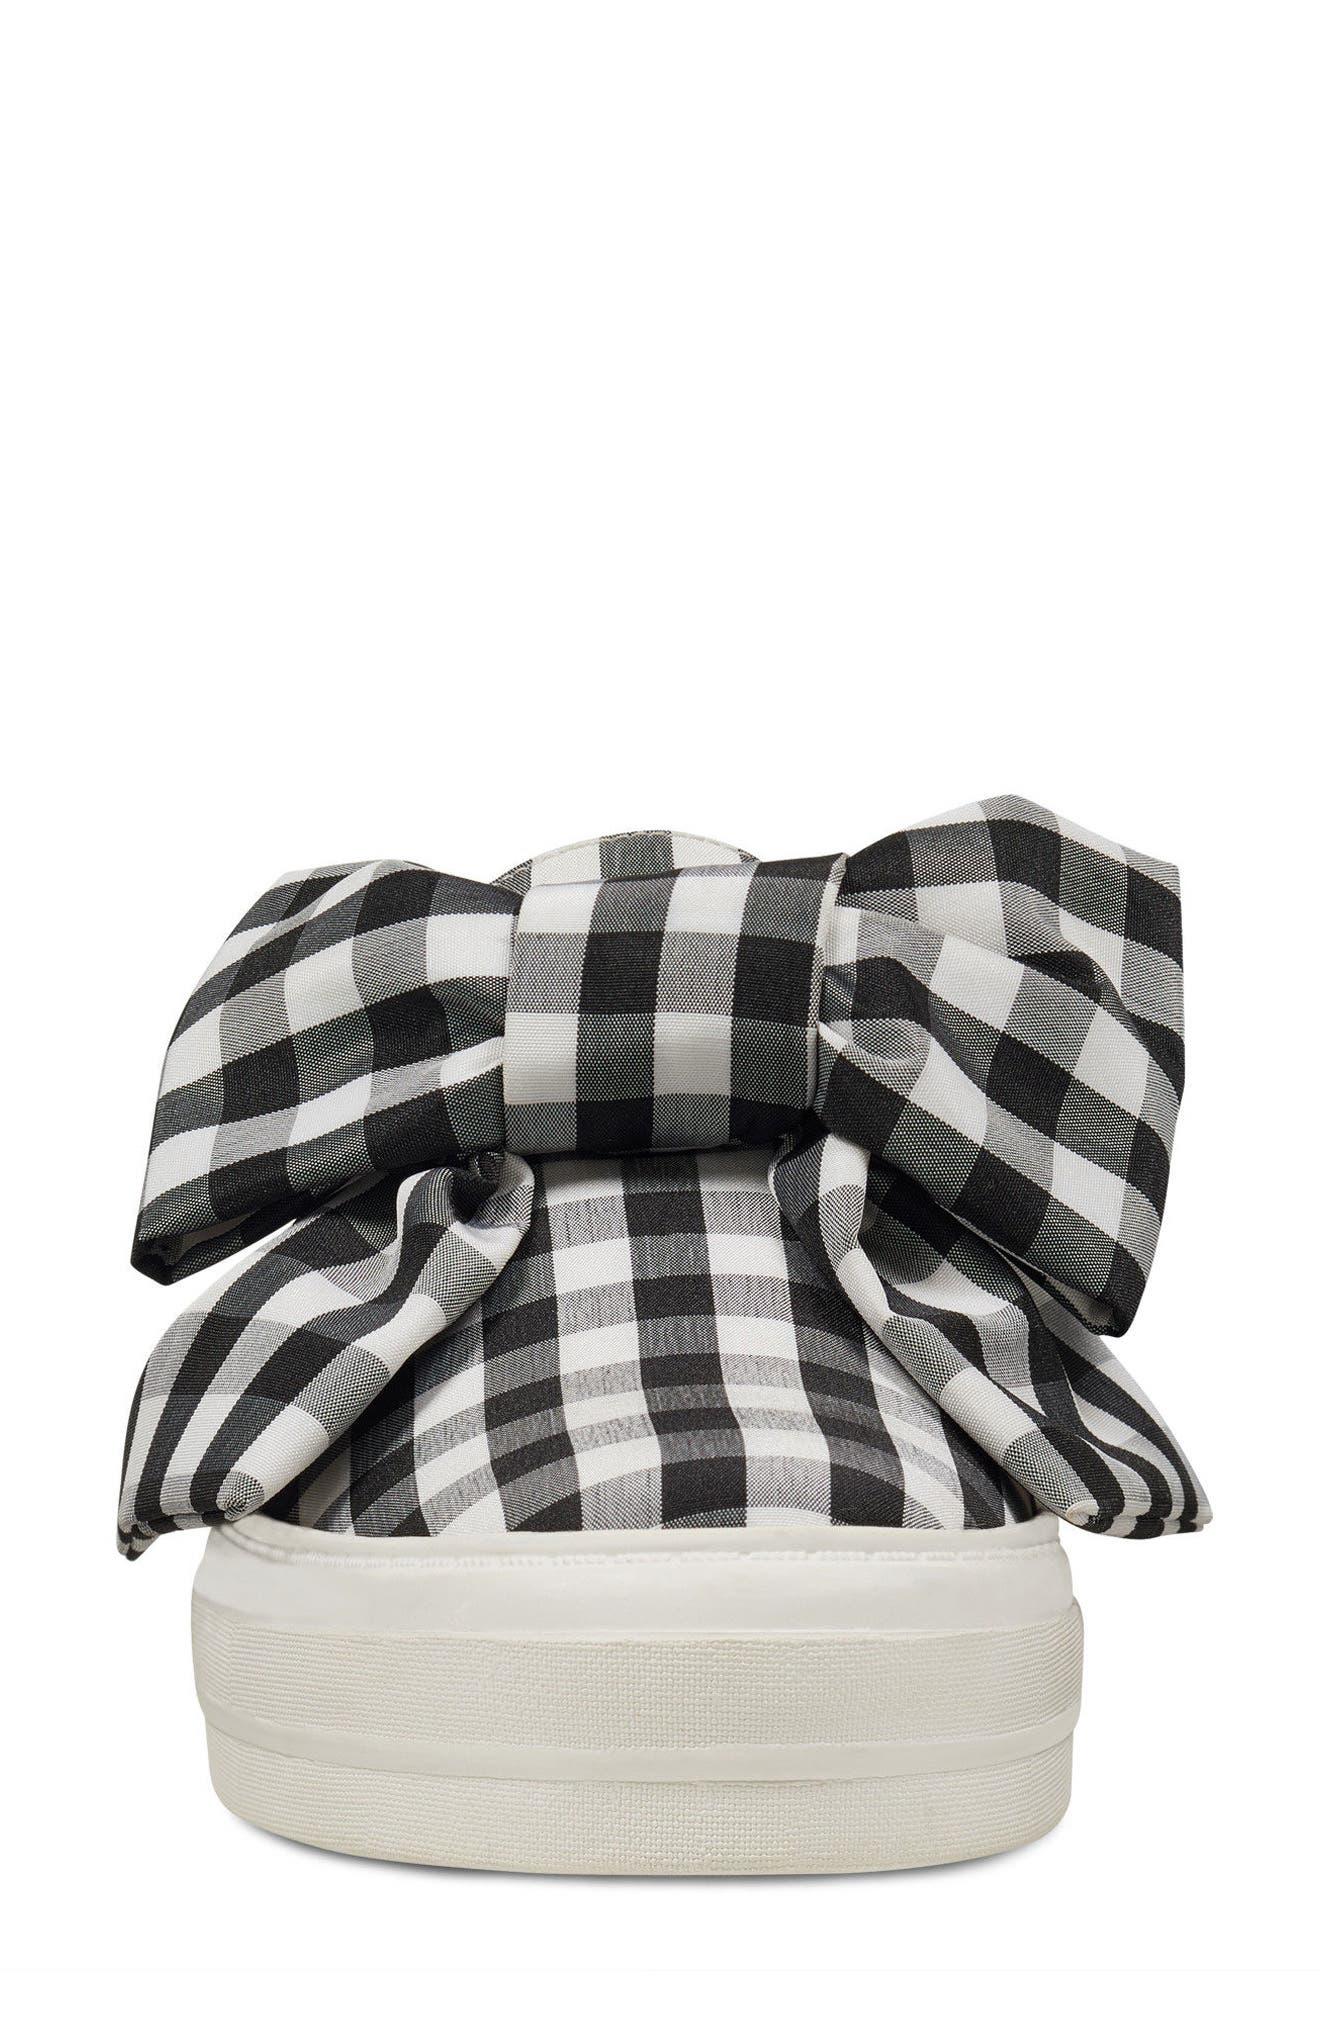 Onosha Bow Slip-On Sneaker,                             Alternate thumbnail 4, color,                             Black/ White Fabric